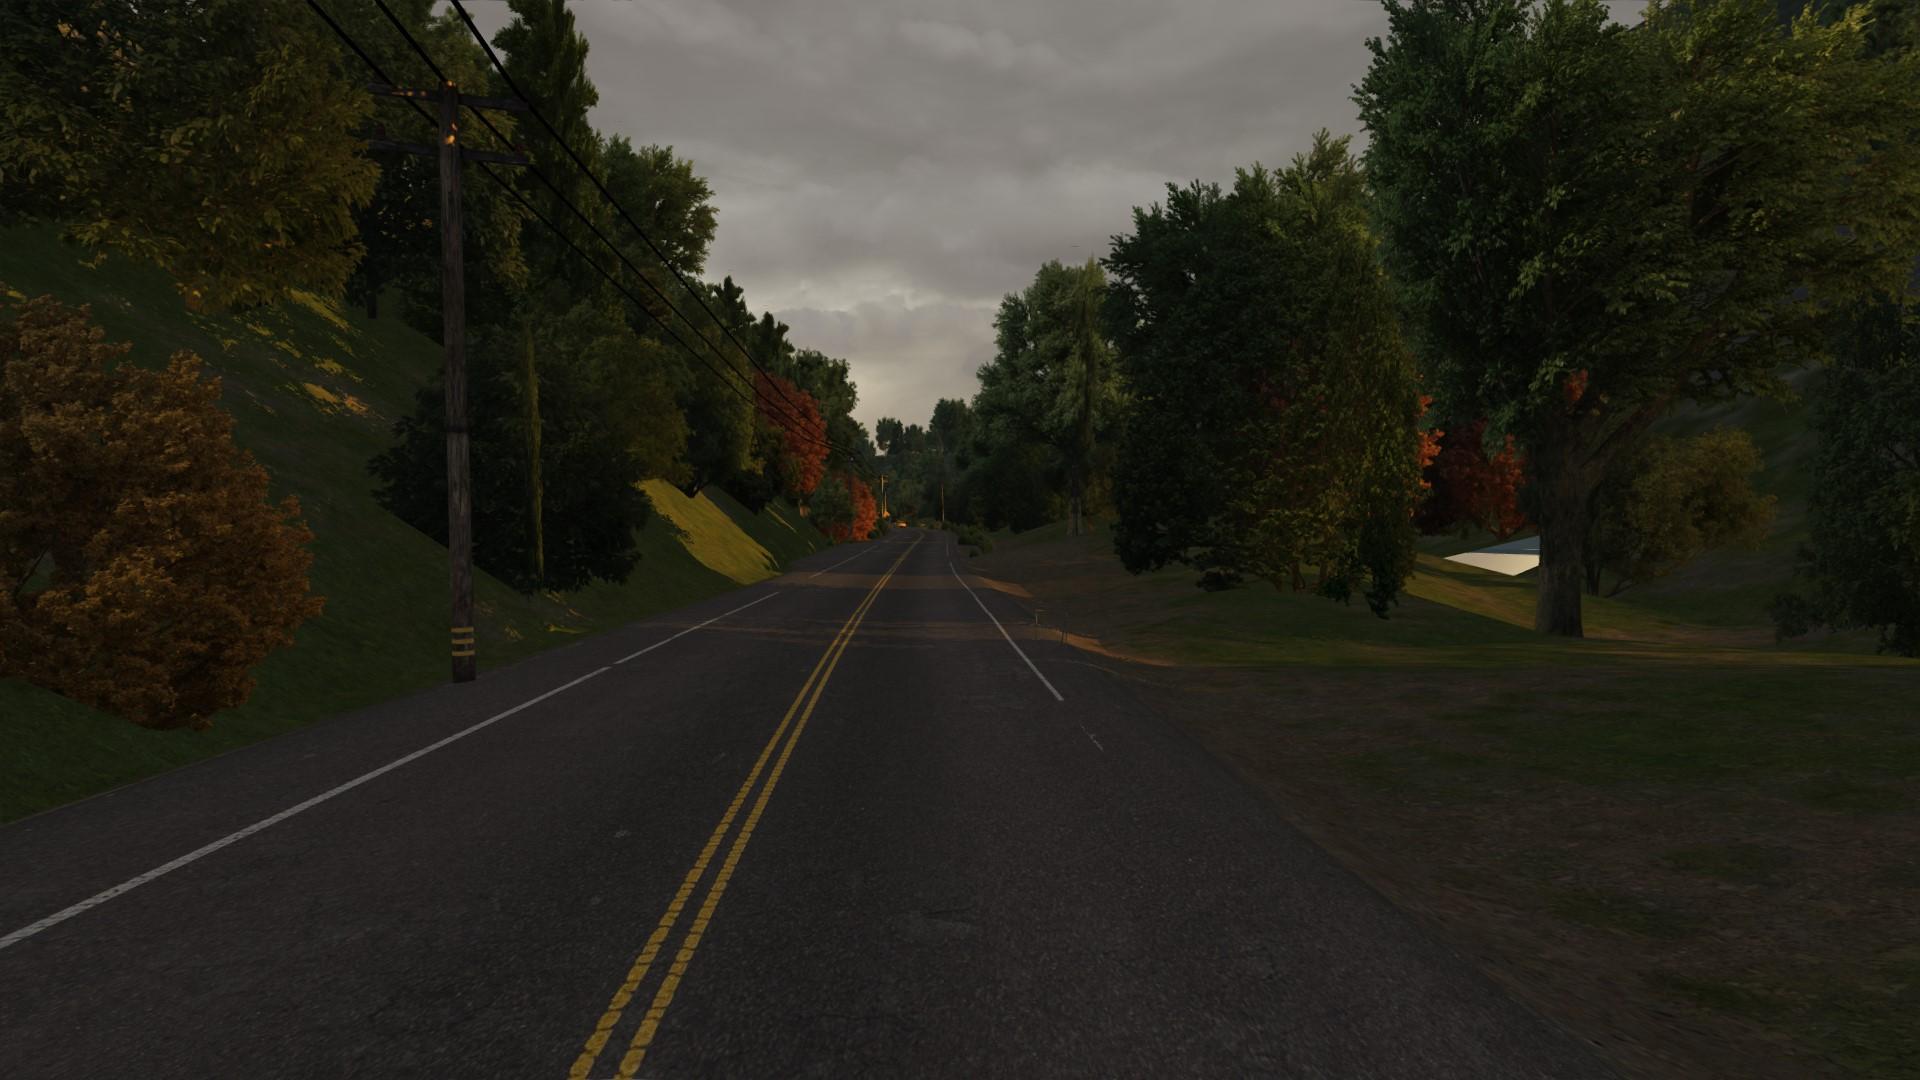 Screenshot_rem_rs4_b8_avant_topanga_canyon_v1_9-7-121-22-56-10.jpg